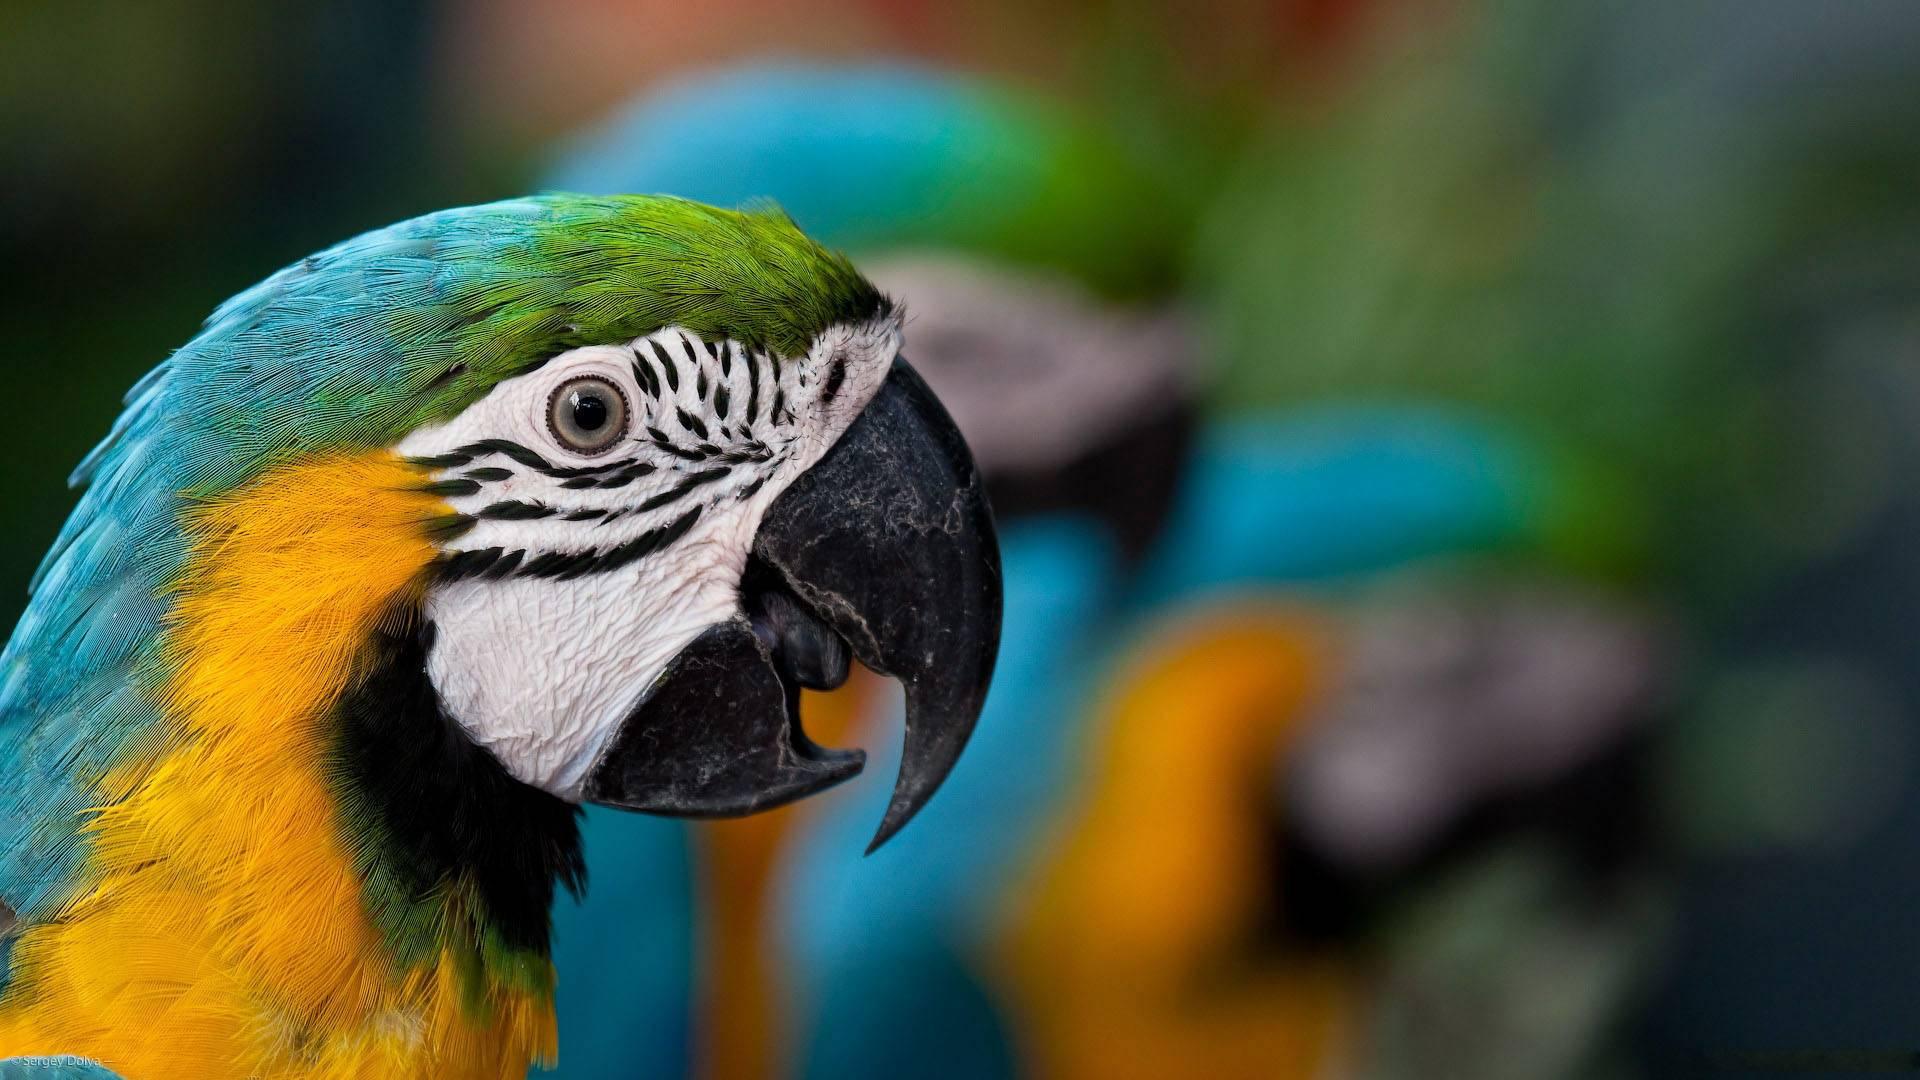 Parrots hd wallpapers - Animal and bird hd wallpaper ...